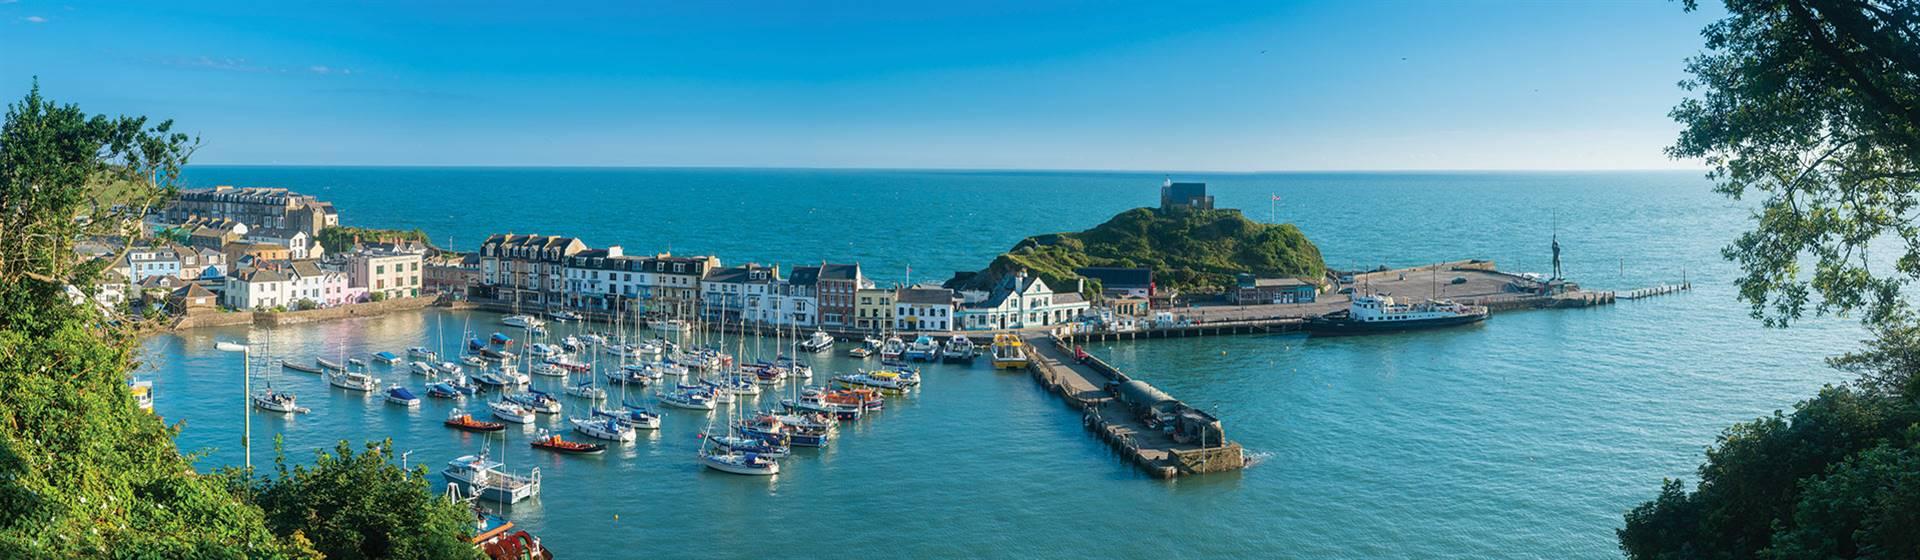 Enchanting Devon:Ilfracombe,Bideford & Cruise 2022